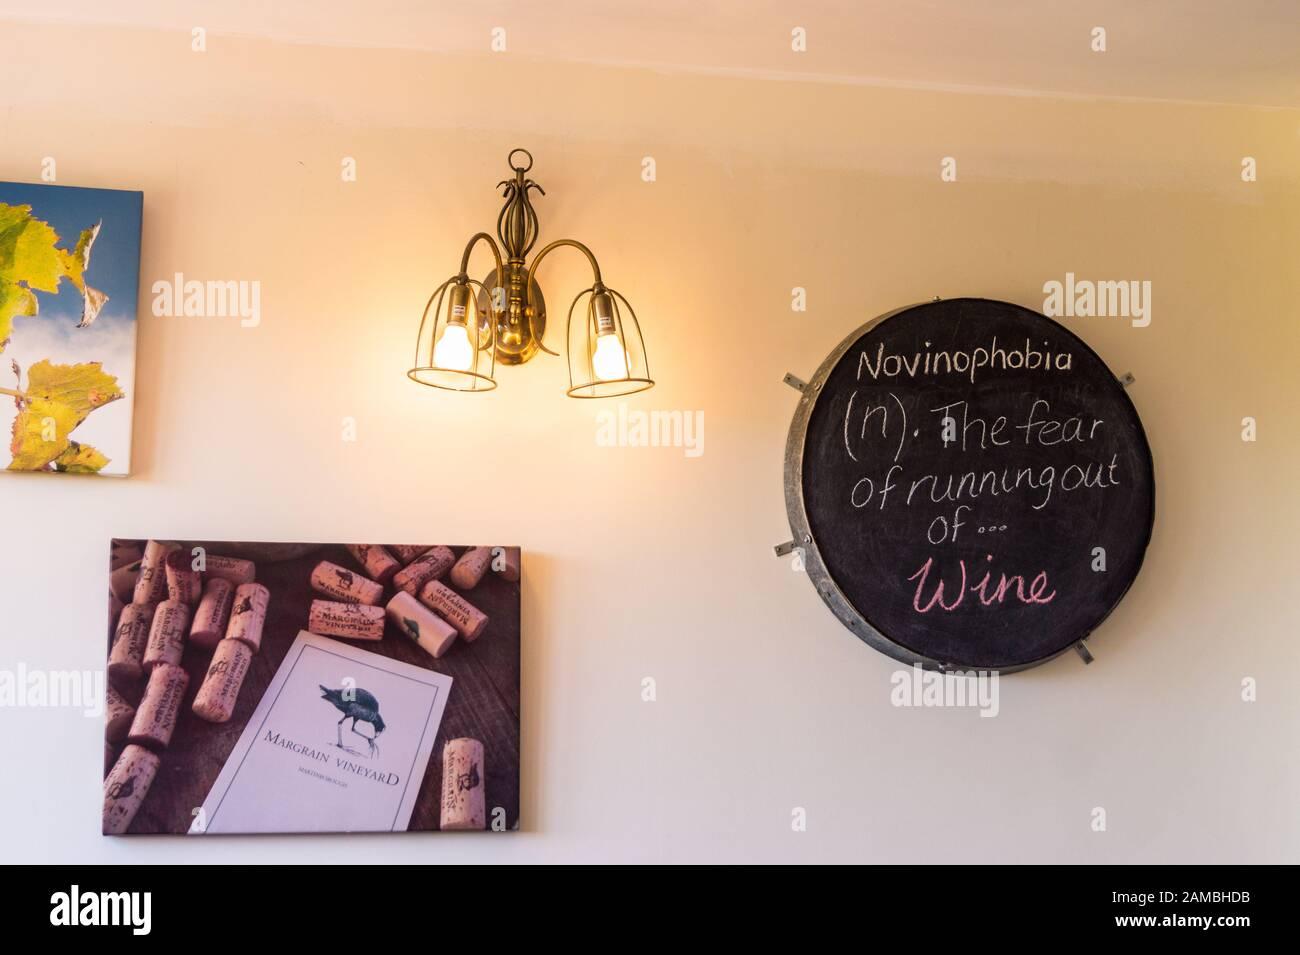 novinophobia-n-the-fear-of-running-out-of-wine-humorous-sign-margrain-vineyard-martinborough-wairarapa-new-zealand-2AMBHDB.jpg